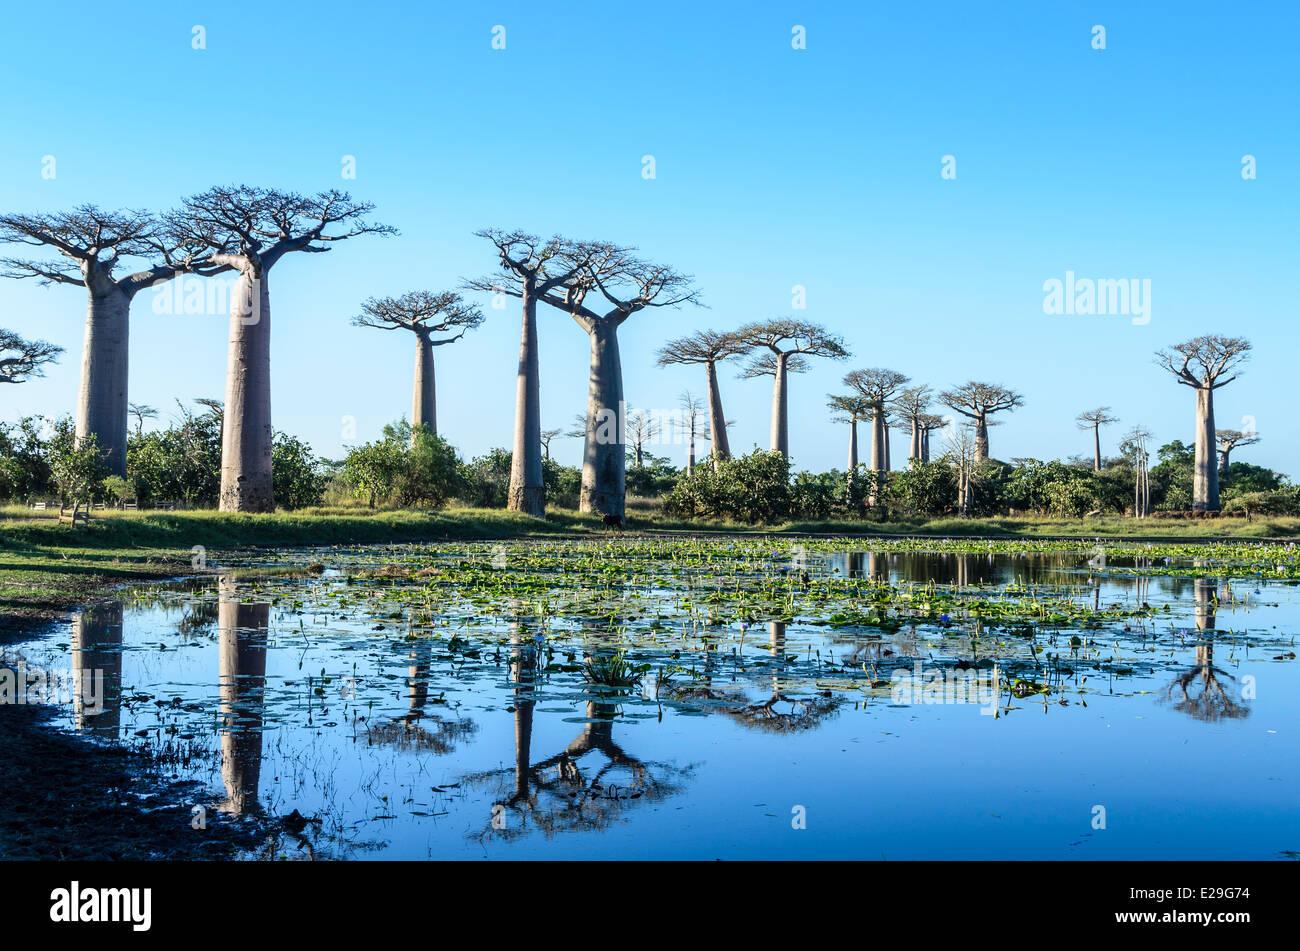 Baobab Trees Reflecting on the Water, Madagascar - Stock Image